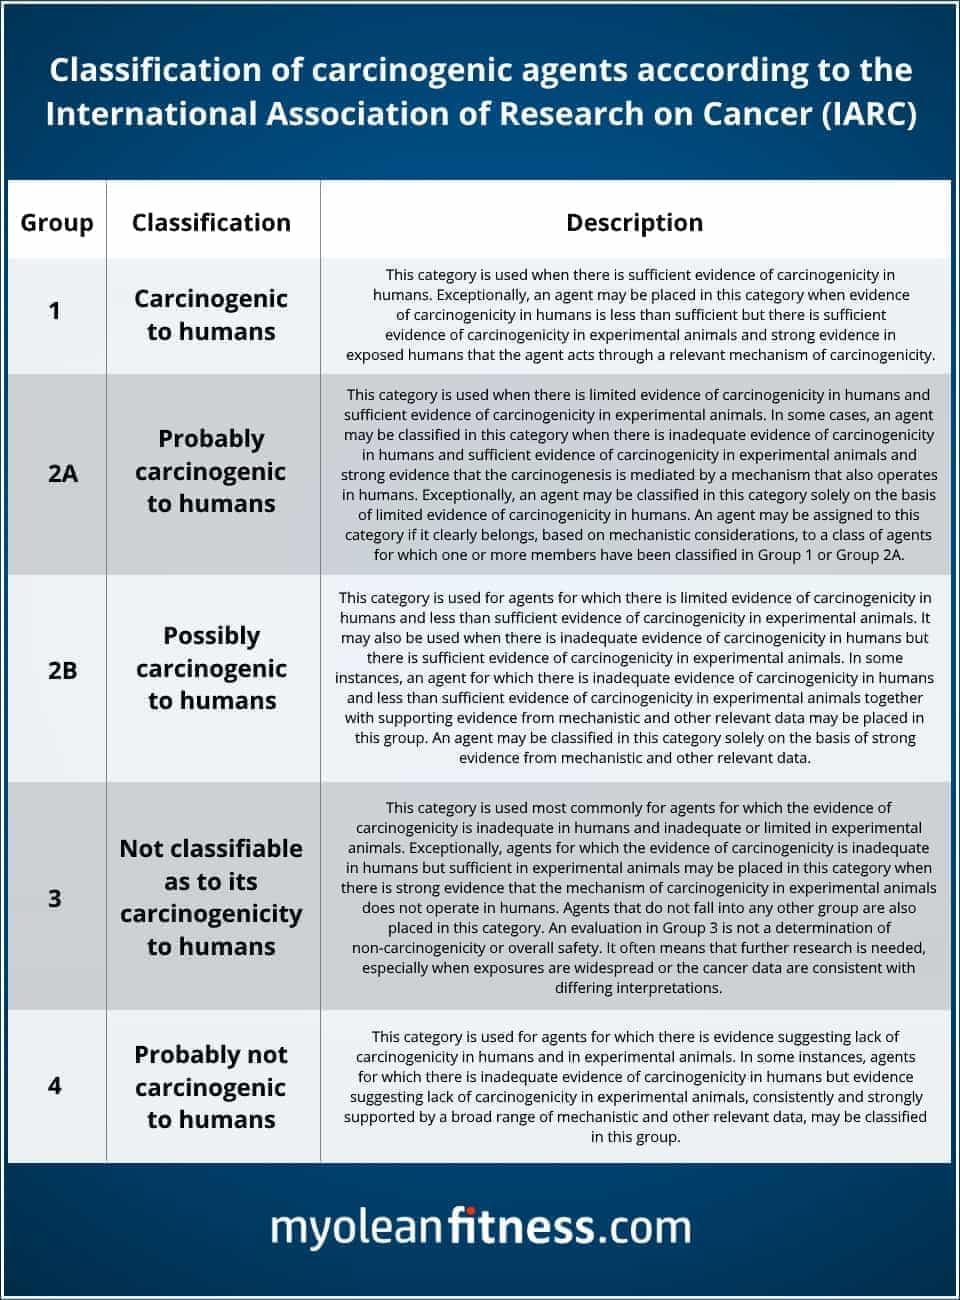 Cancer Risk Classifications - IARC - Myolean Fitness